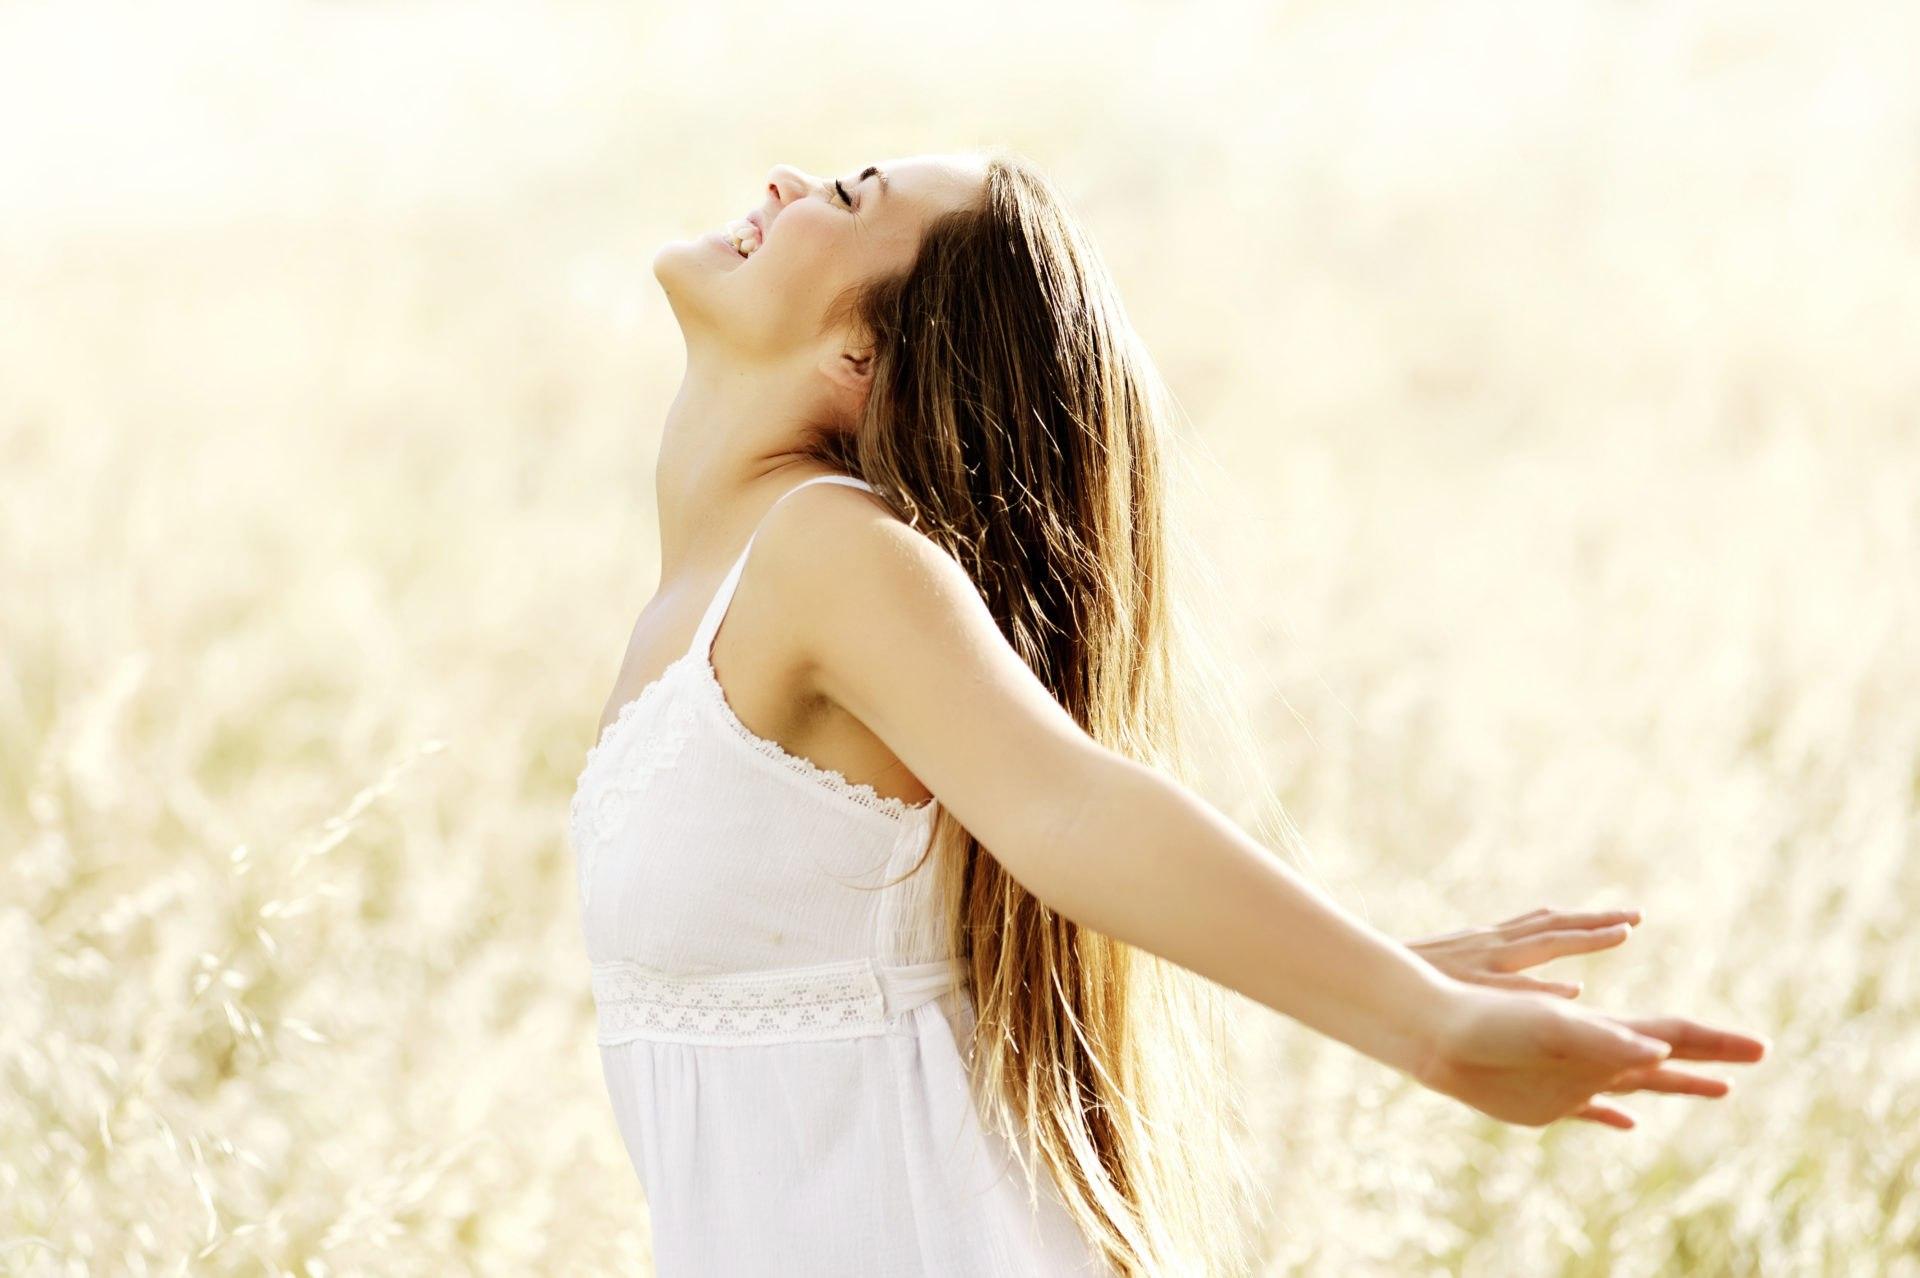 joyful carefree woman